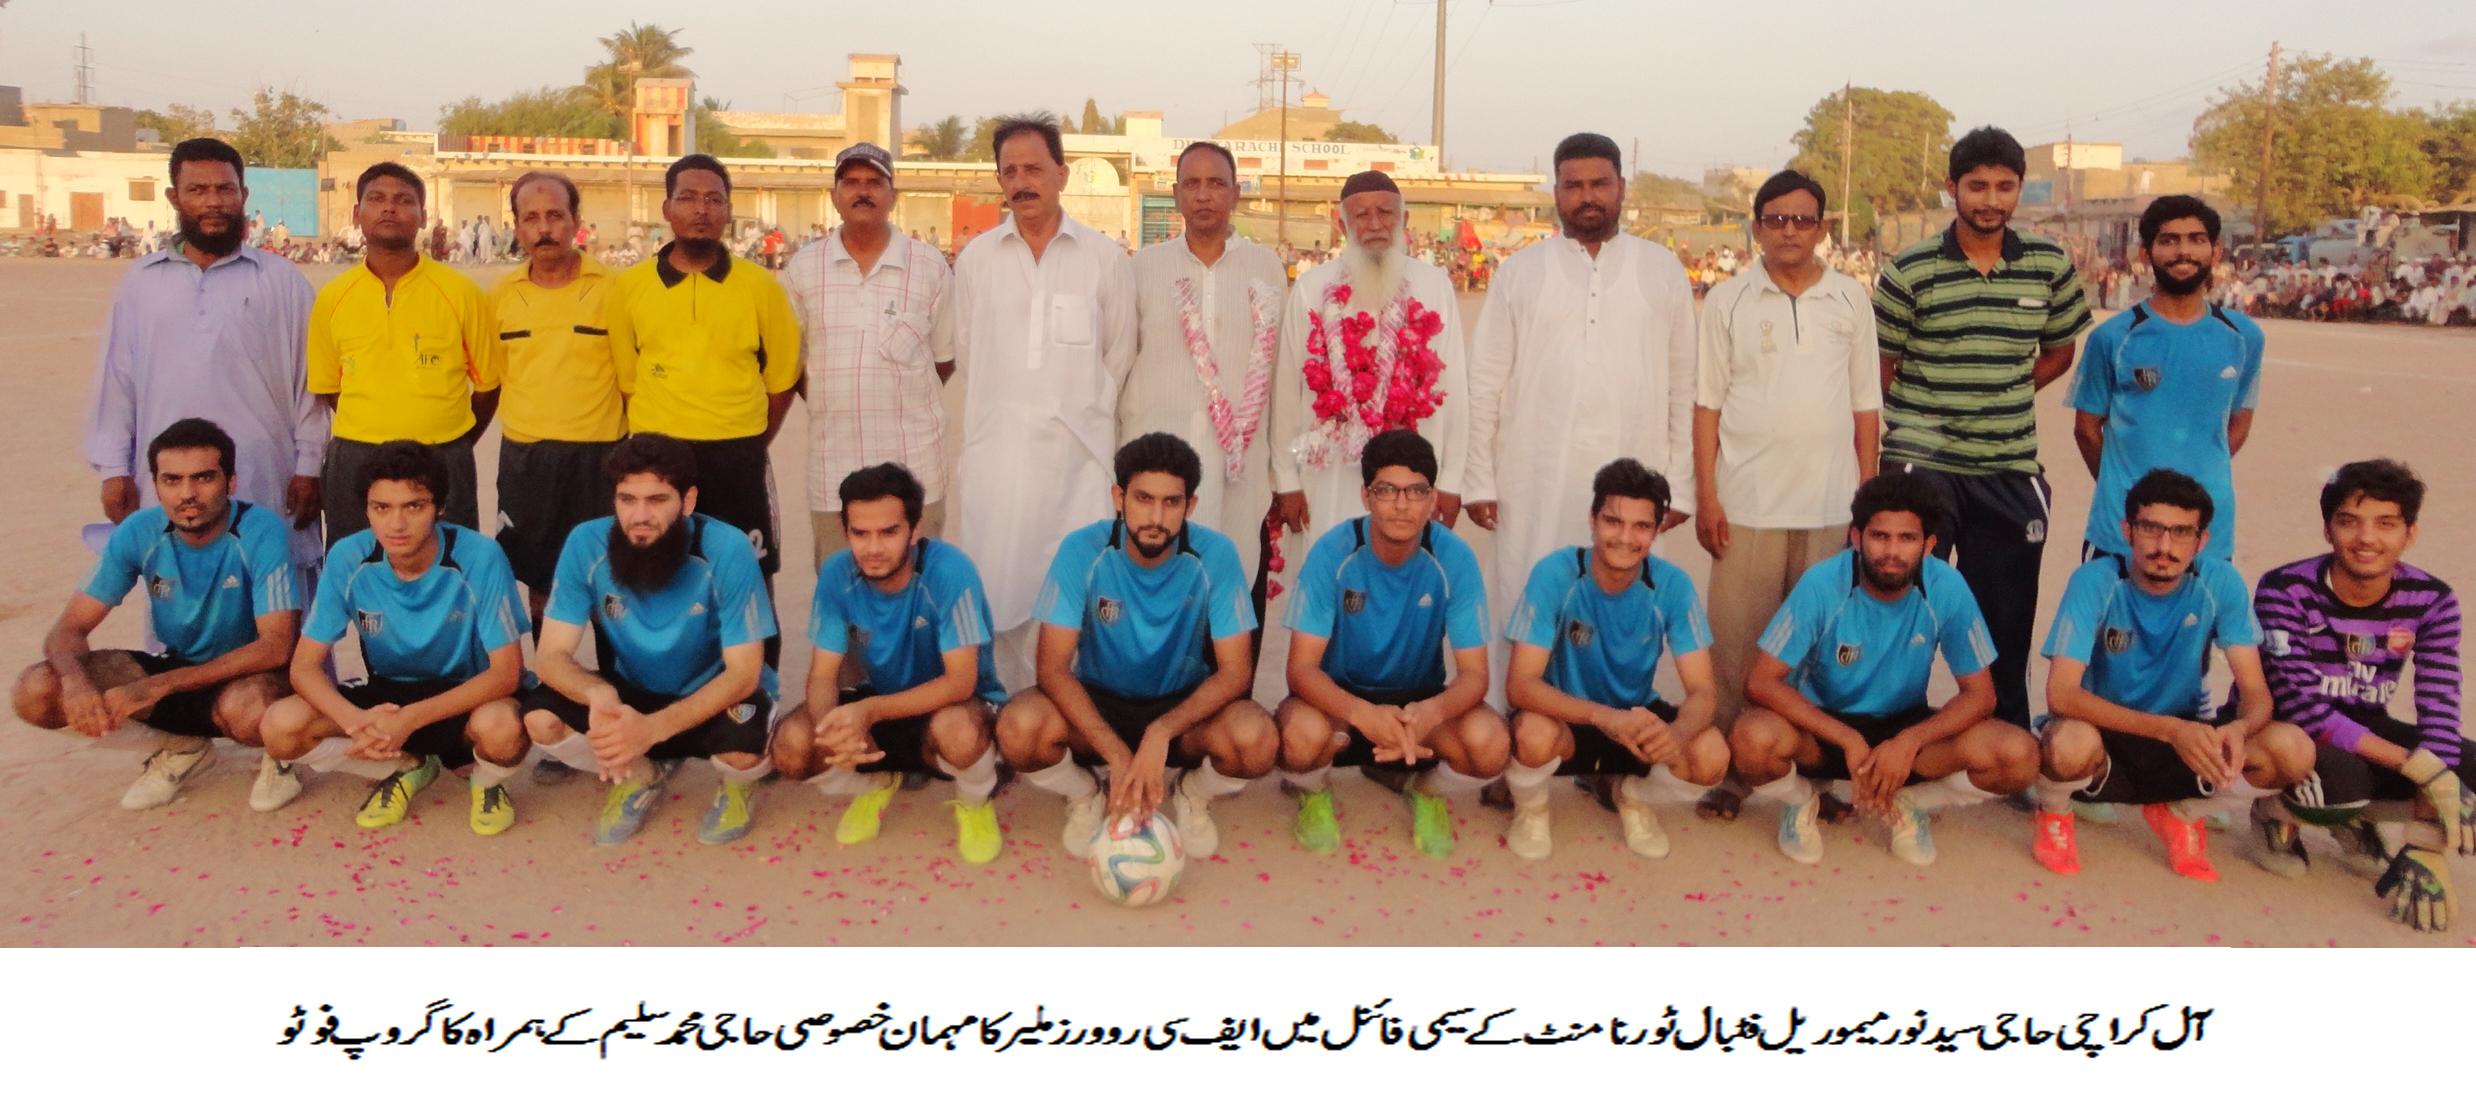 All-Karachi Syed Noor Memorial Tournament: FC Rovers Malir reach final